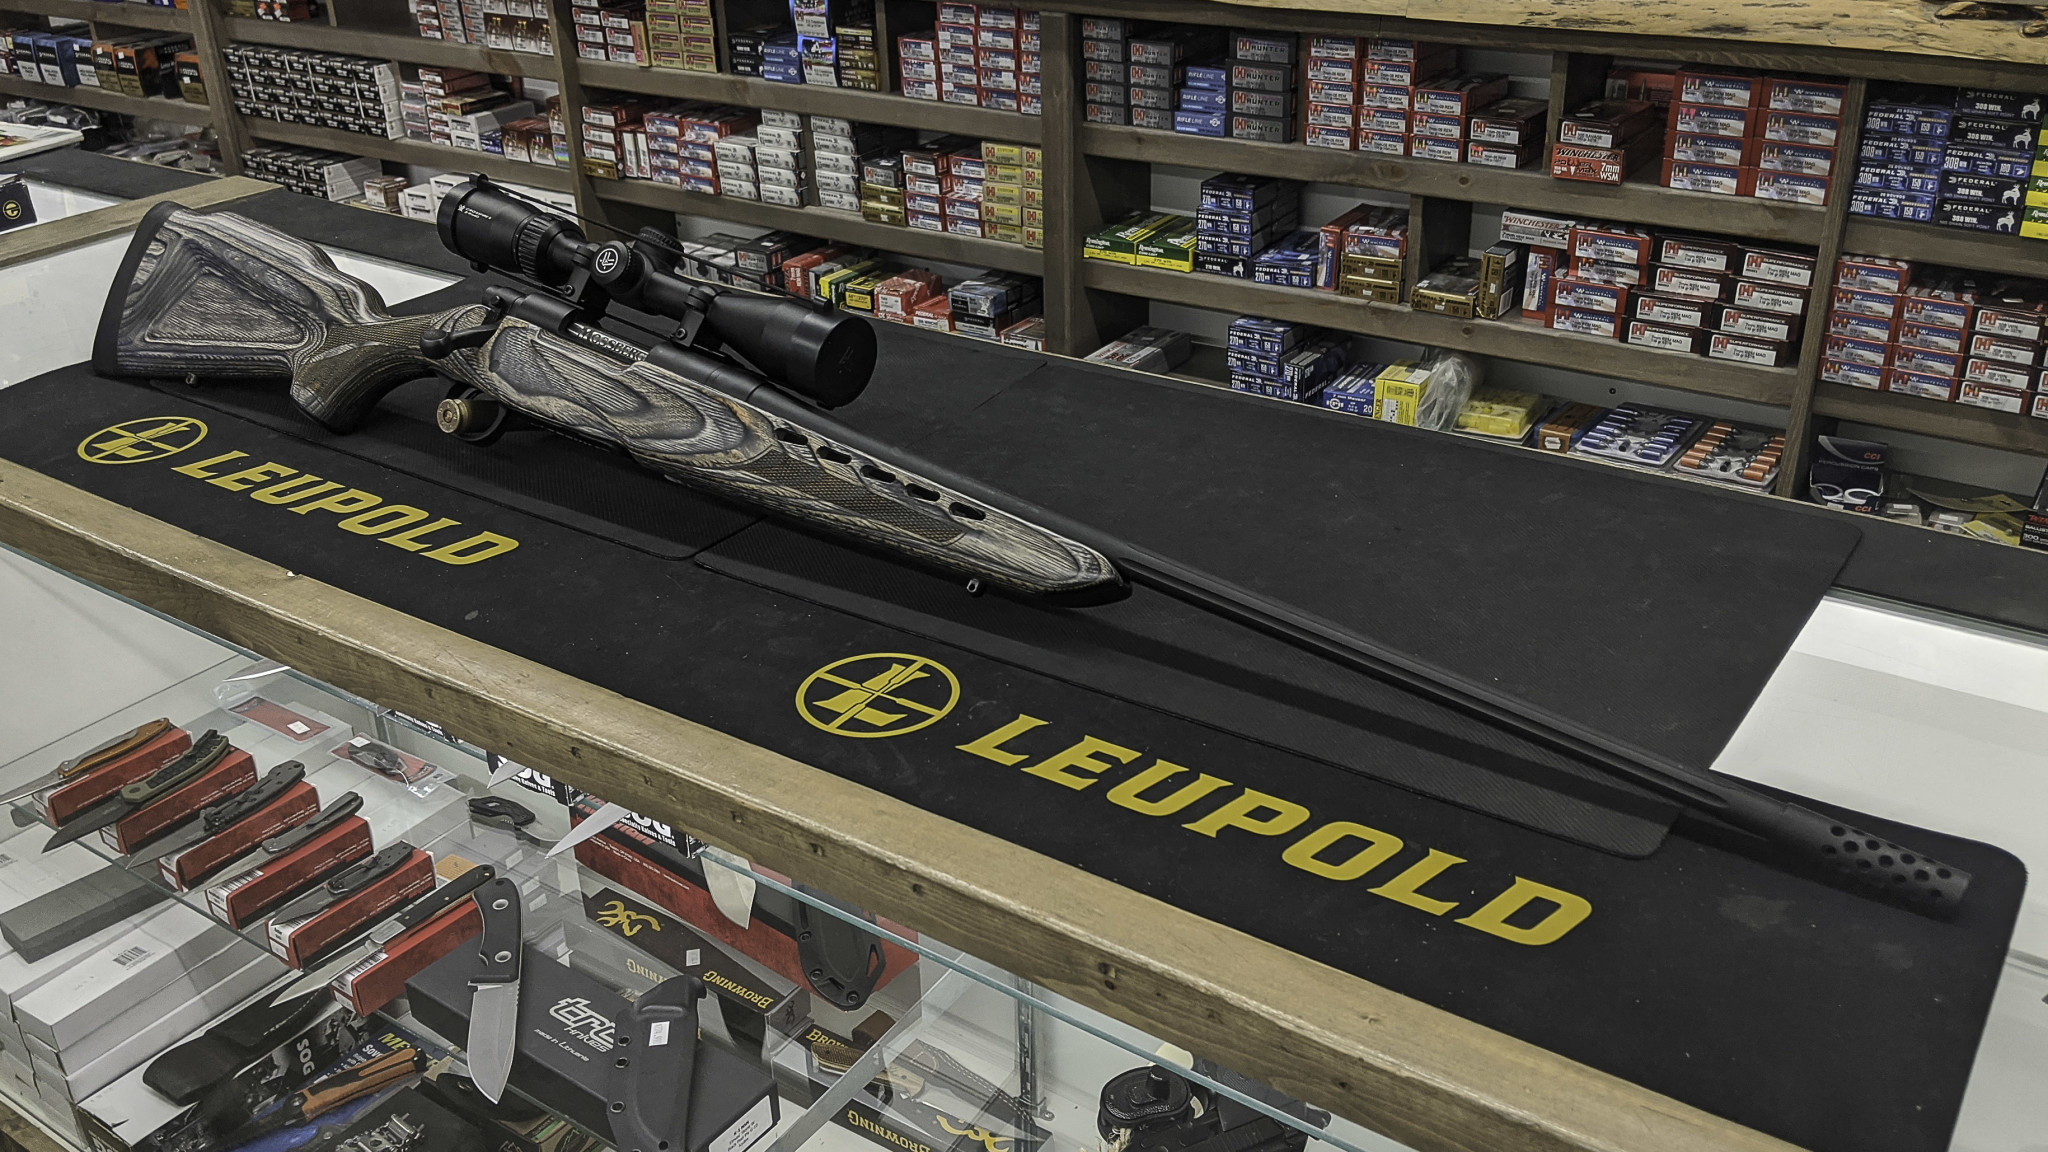 Mossberg 4x4 Laminate 22-250 w/ Vortex Crossfire 3-9x40mm